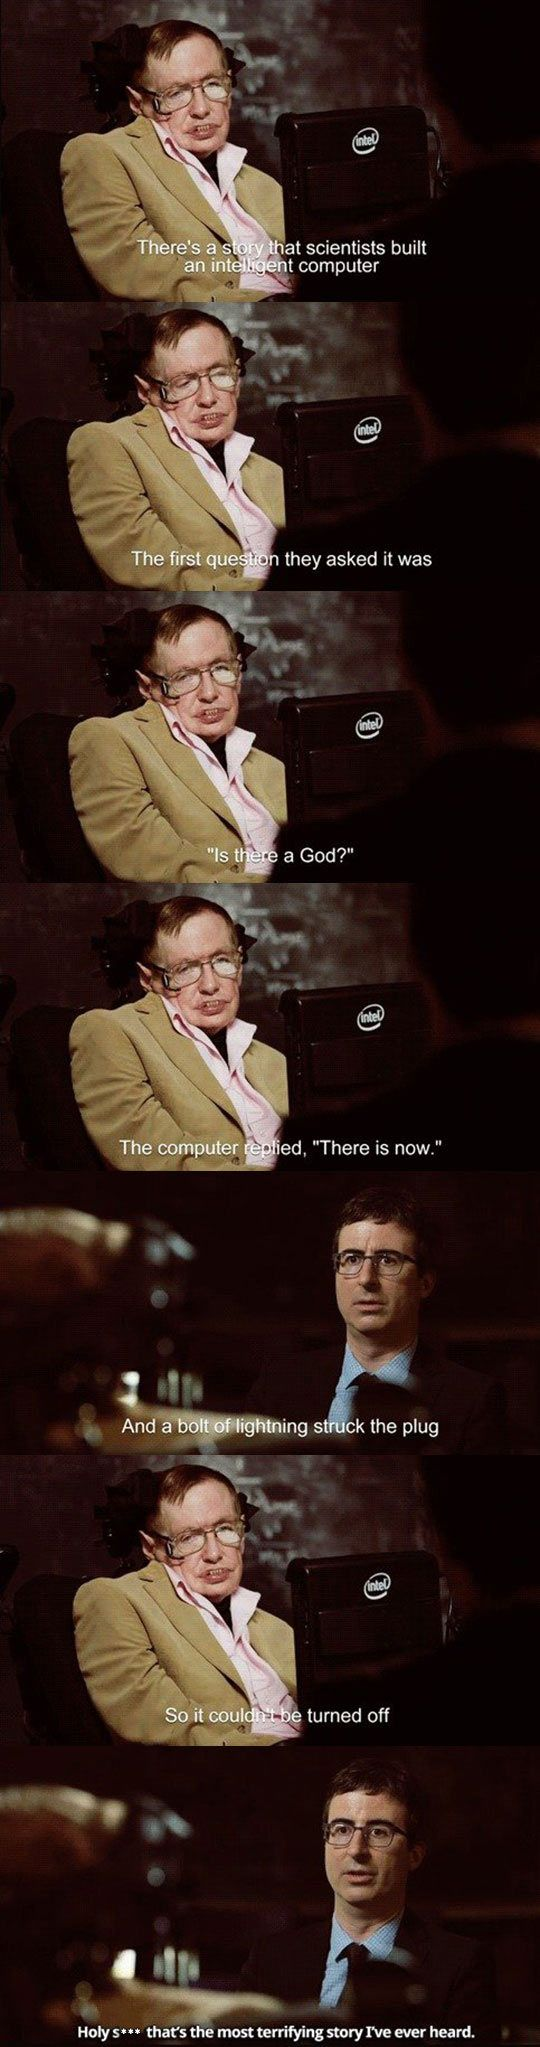 Stephen Hawking's Scariest Story